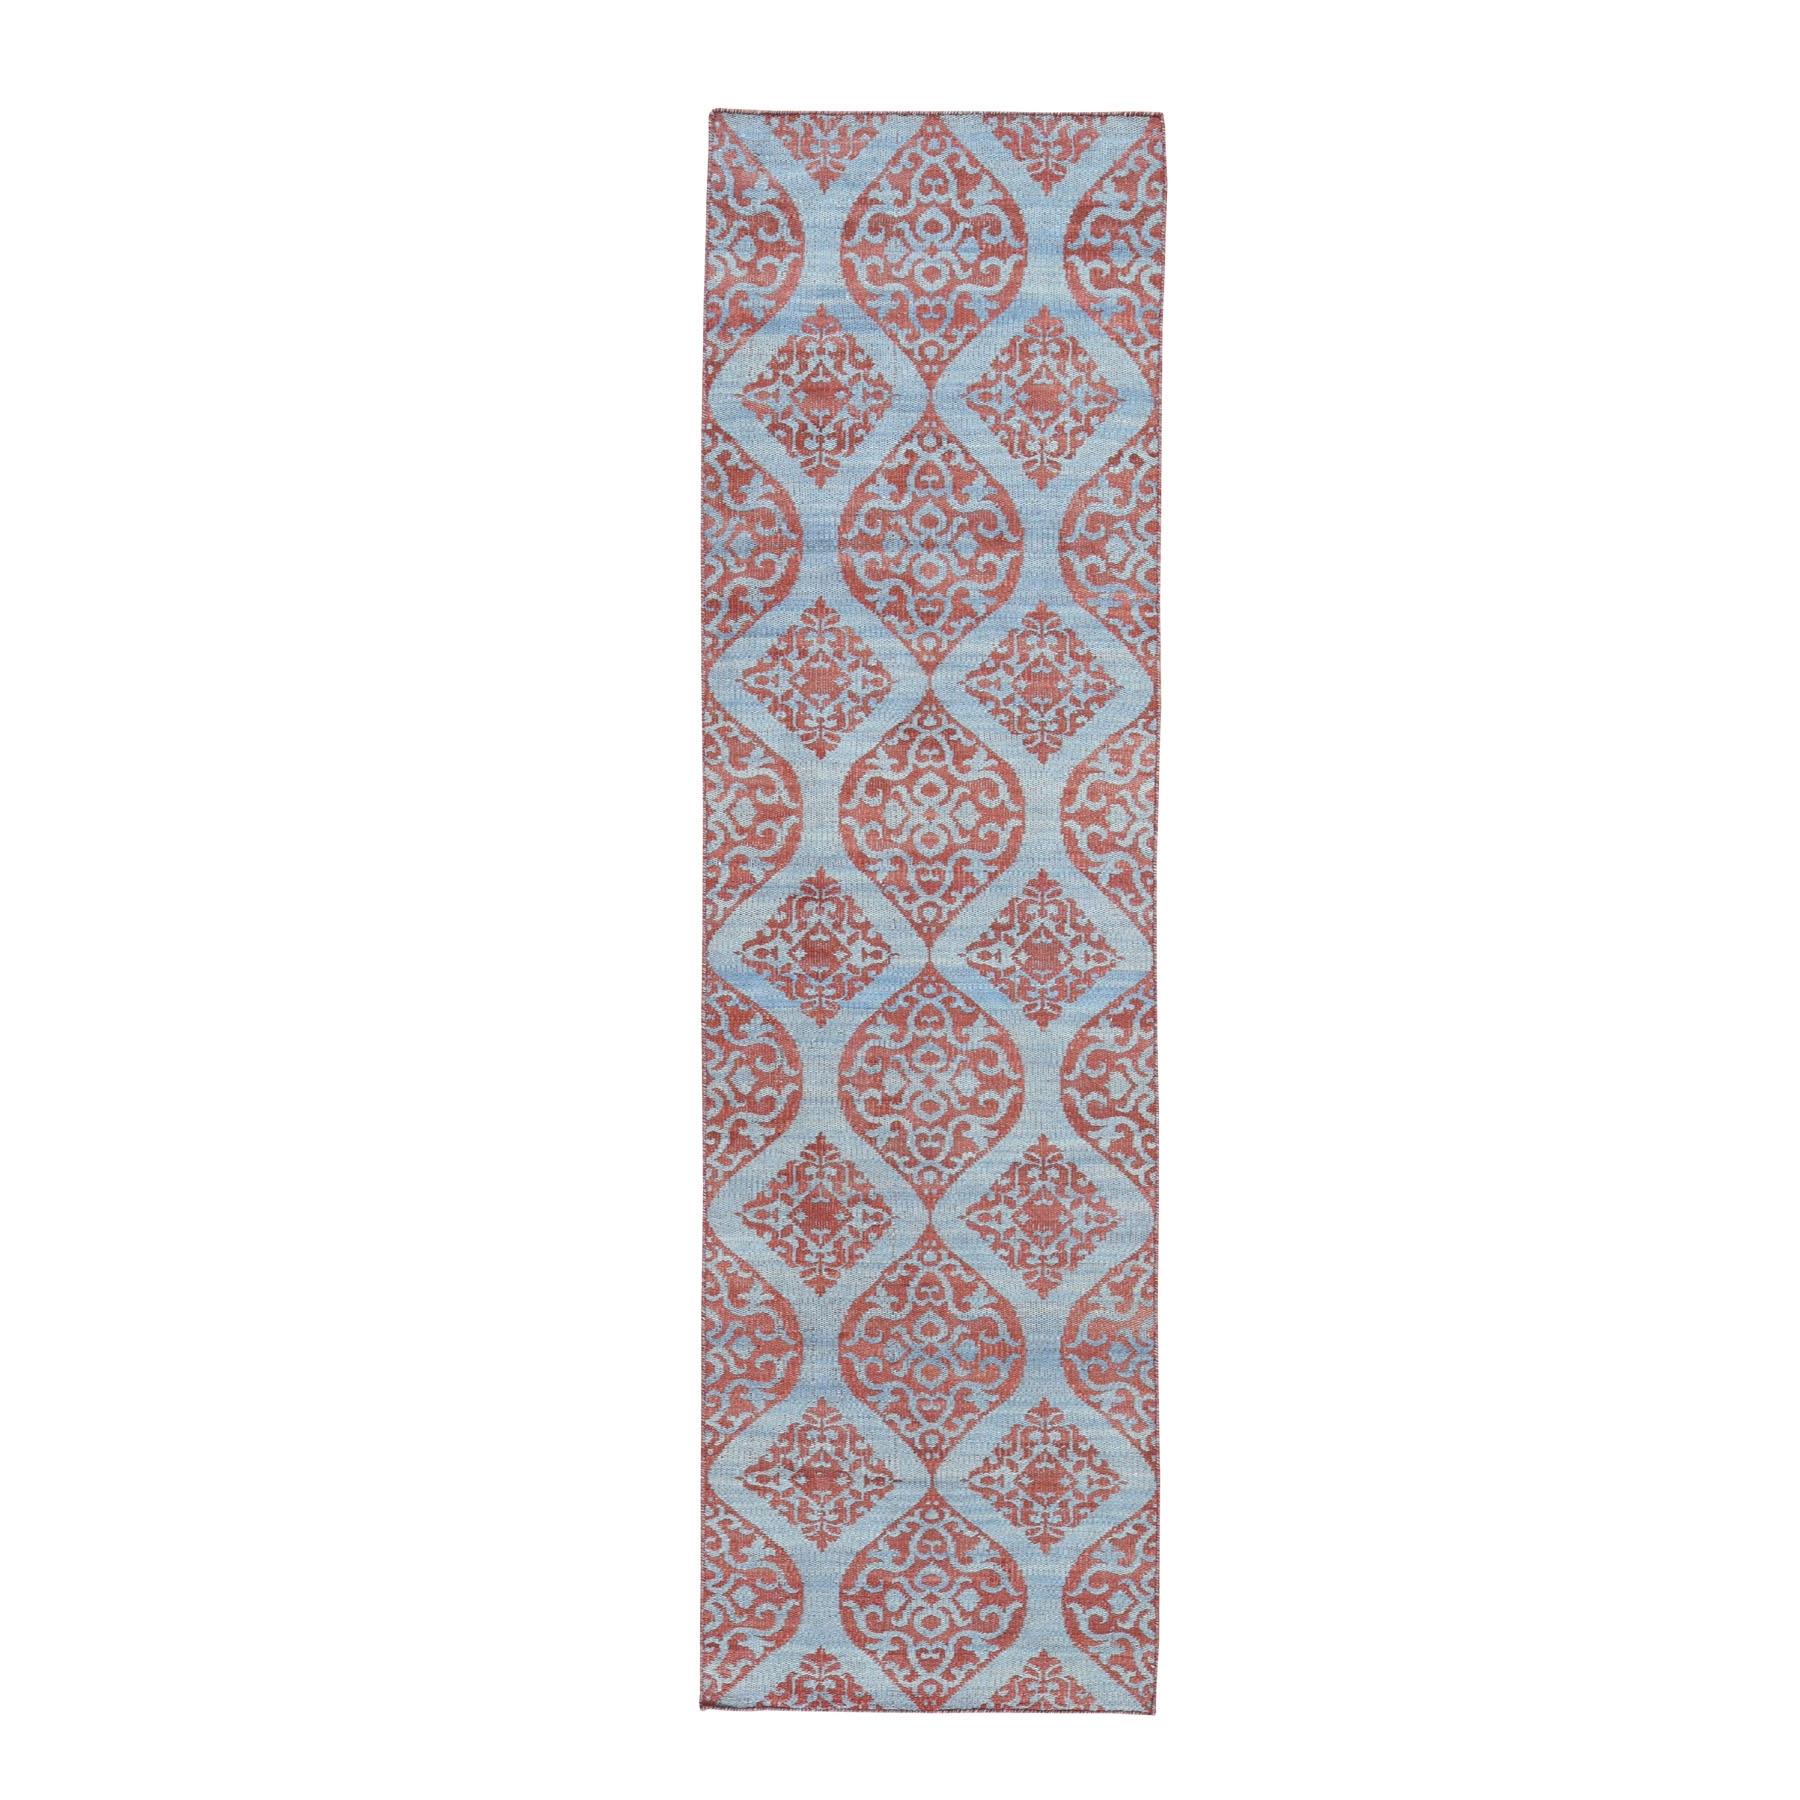 "2'6""X9'9"" Hand Woven Reversible Kilim Flat Weave Runner Oriental Rug moad7deb"